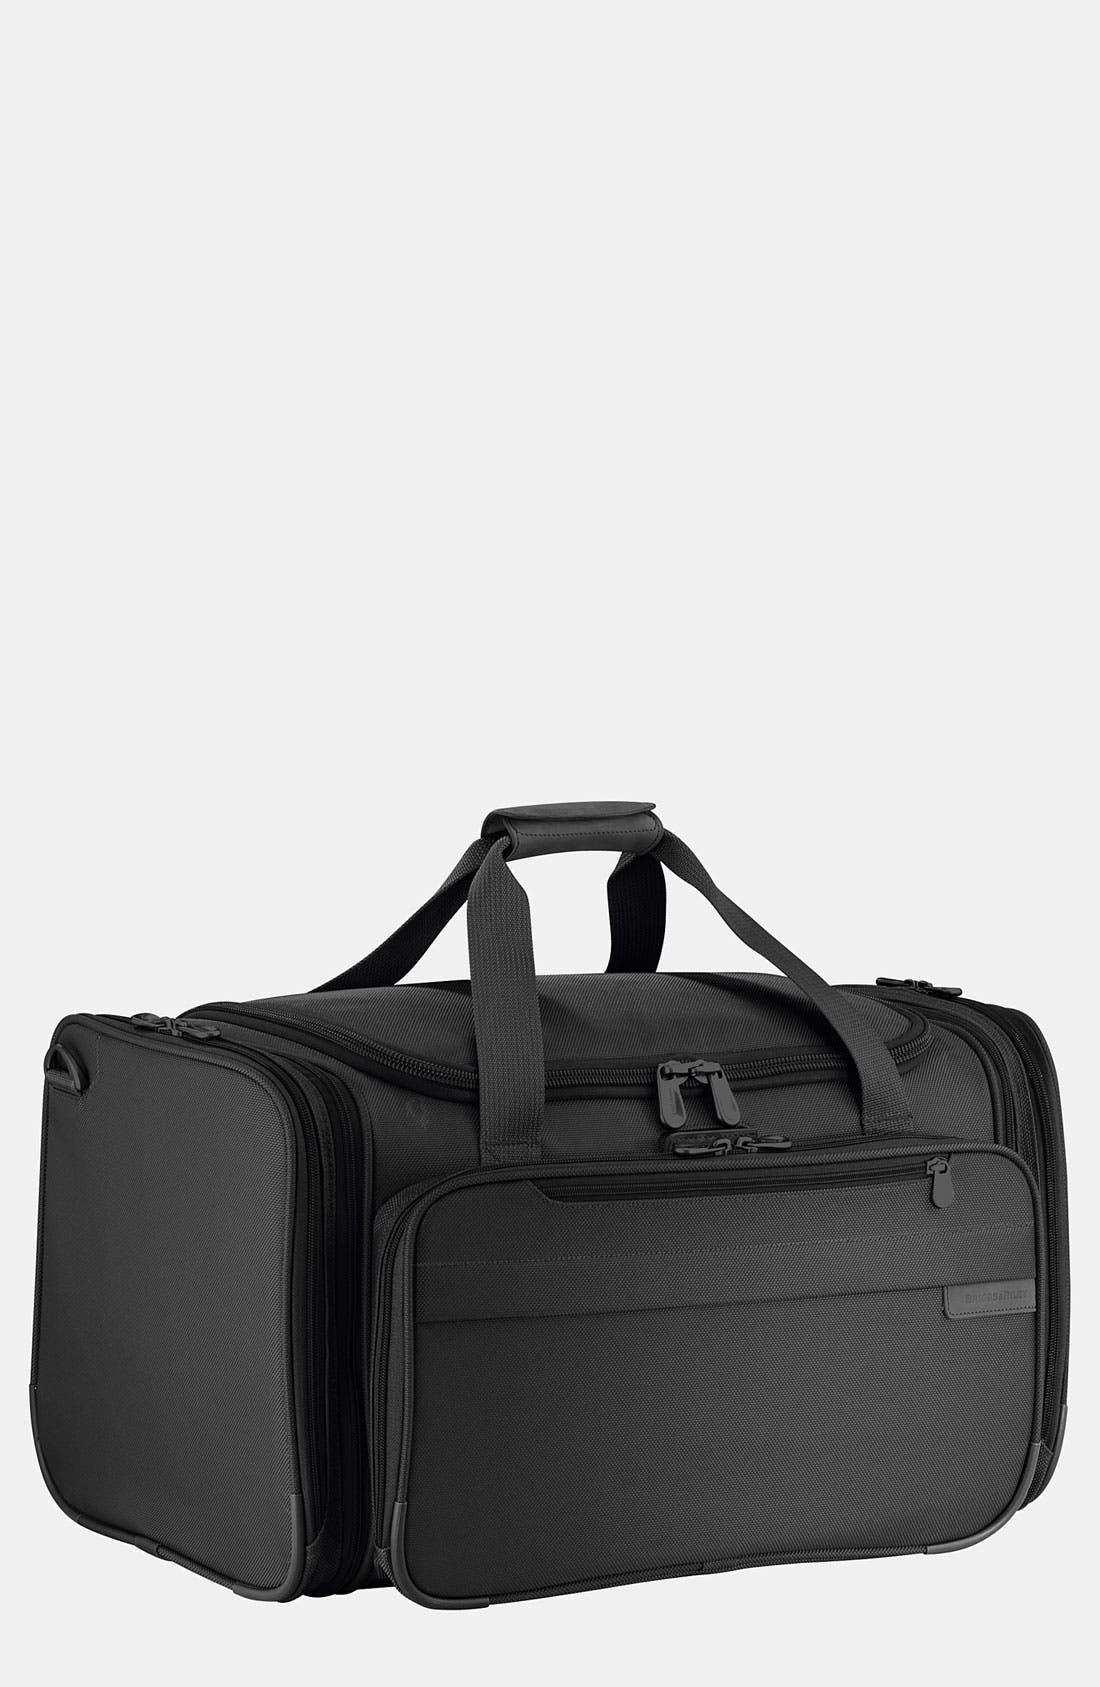 Alternate Image 1 Selected - Briggs & Riley 'Baseline' Expandable Duffel Bag